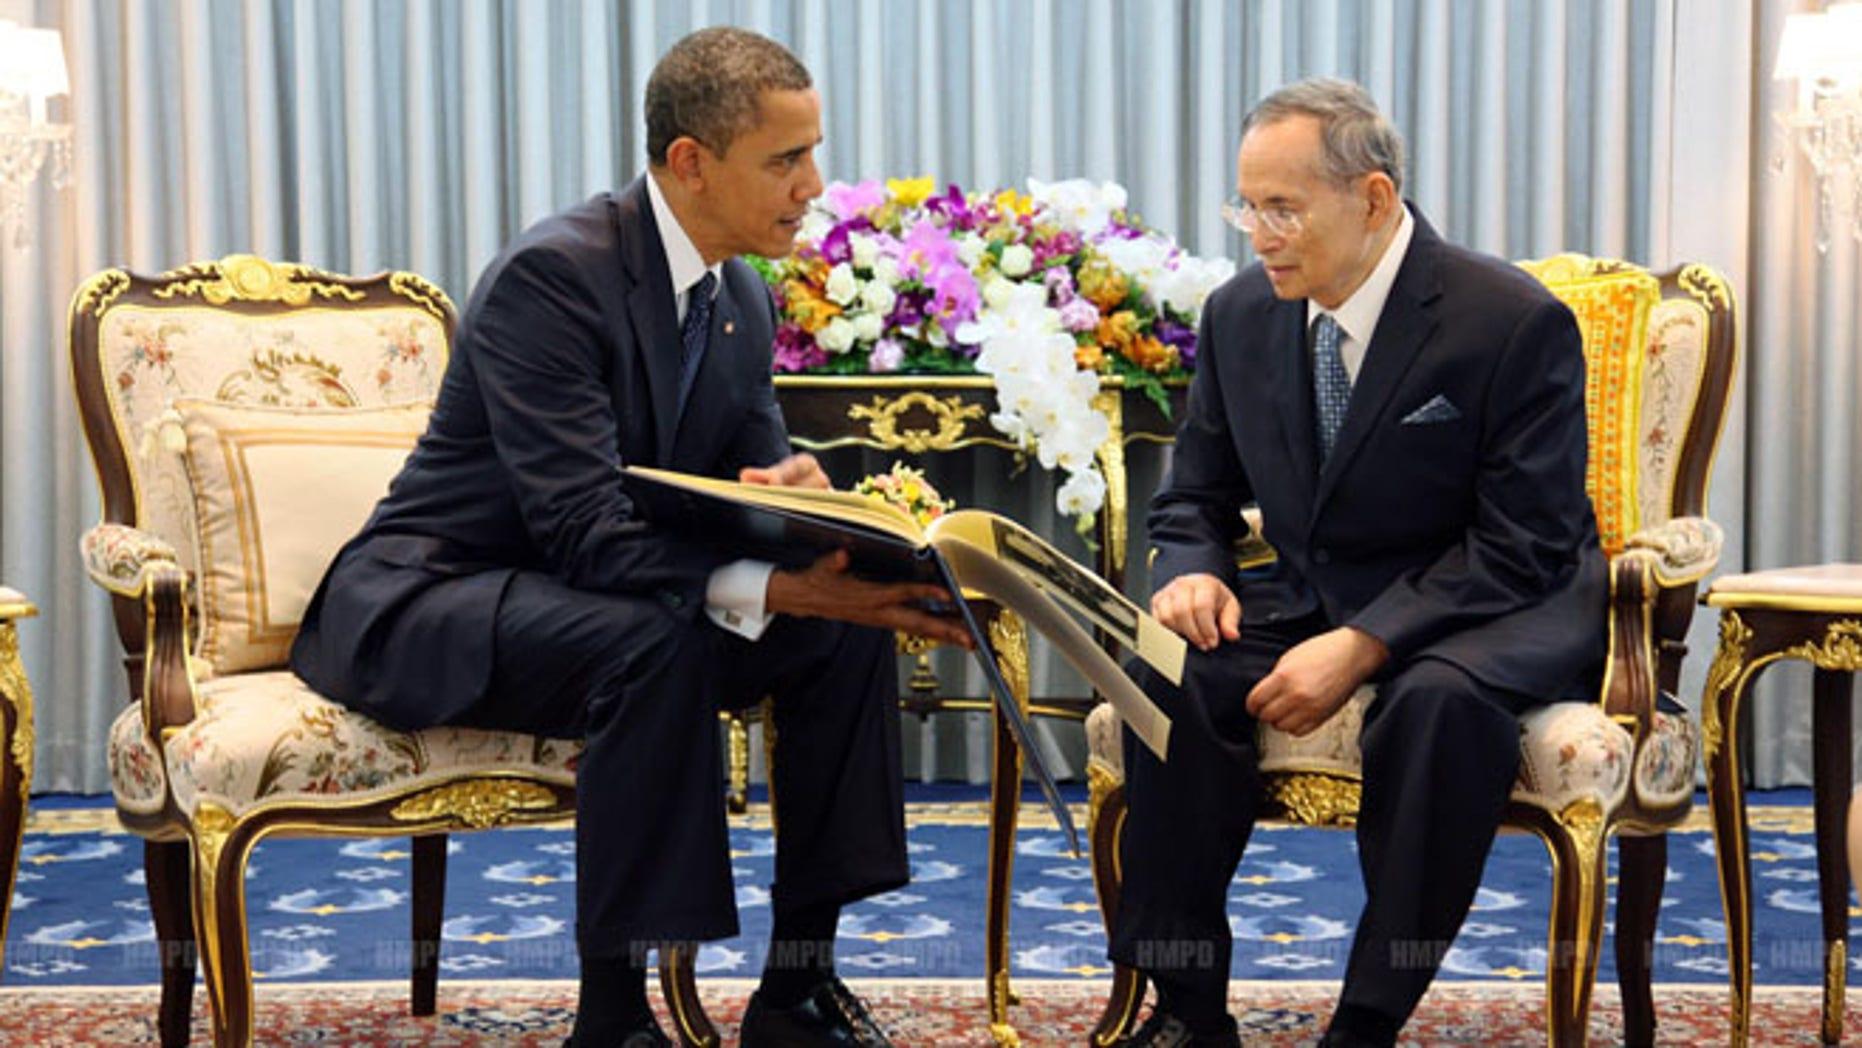 Sunday, Nov. 18, 2012: President Obama, left, talks with Thailand King Bhumibol Adulyadej, at Siriraj Hospital in Bangkok, Thailand.